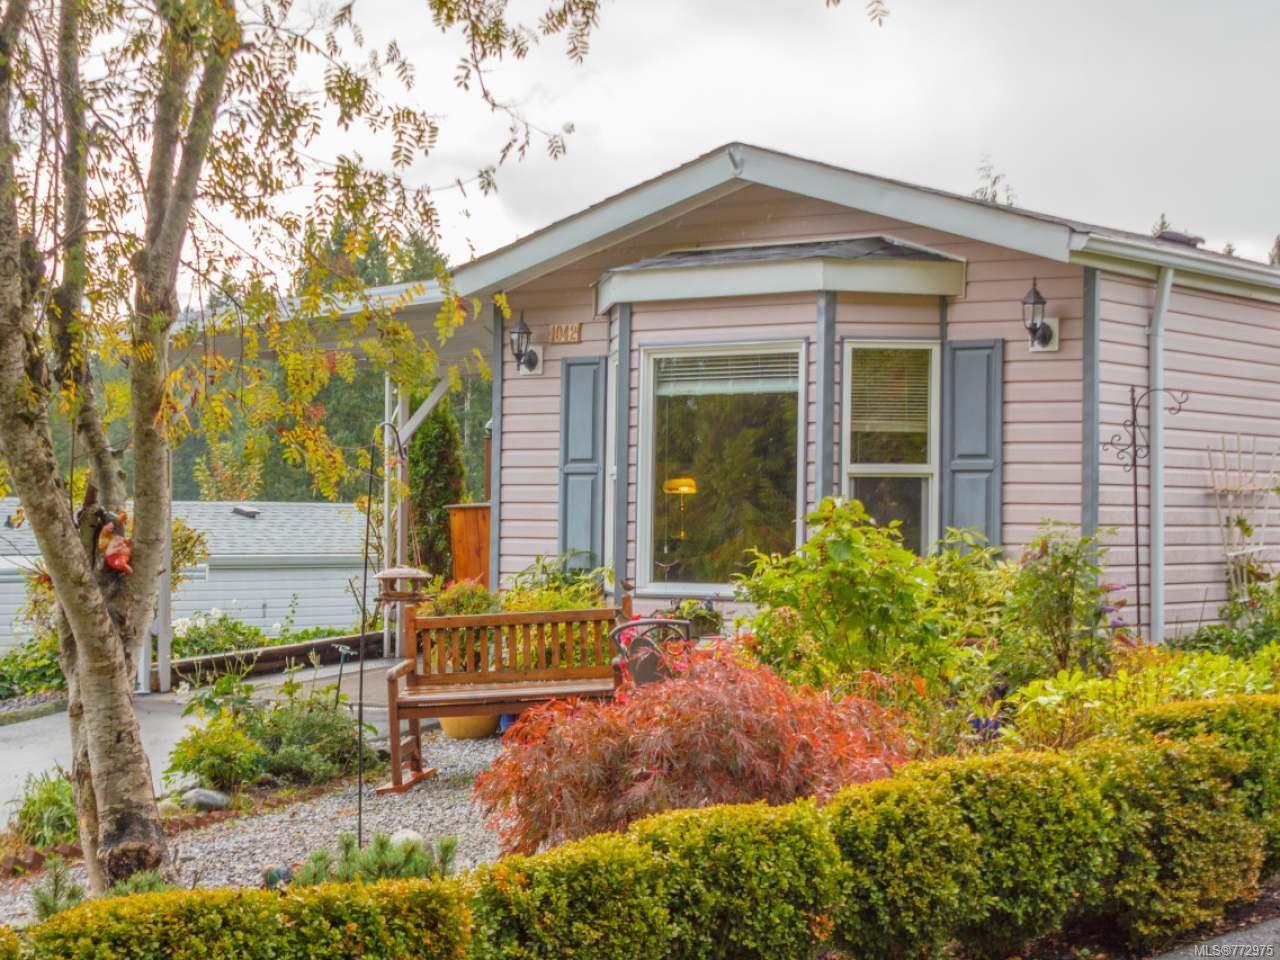 Main Photo: 1042 Collier Cres in NANAIMO: Na South Nanaimo Manufactured Home for sale (Nanaimo)  : MLS®# 772975